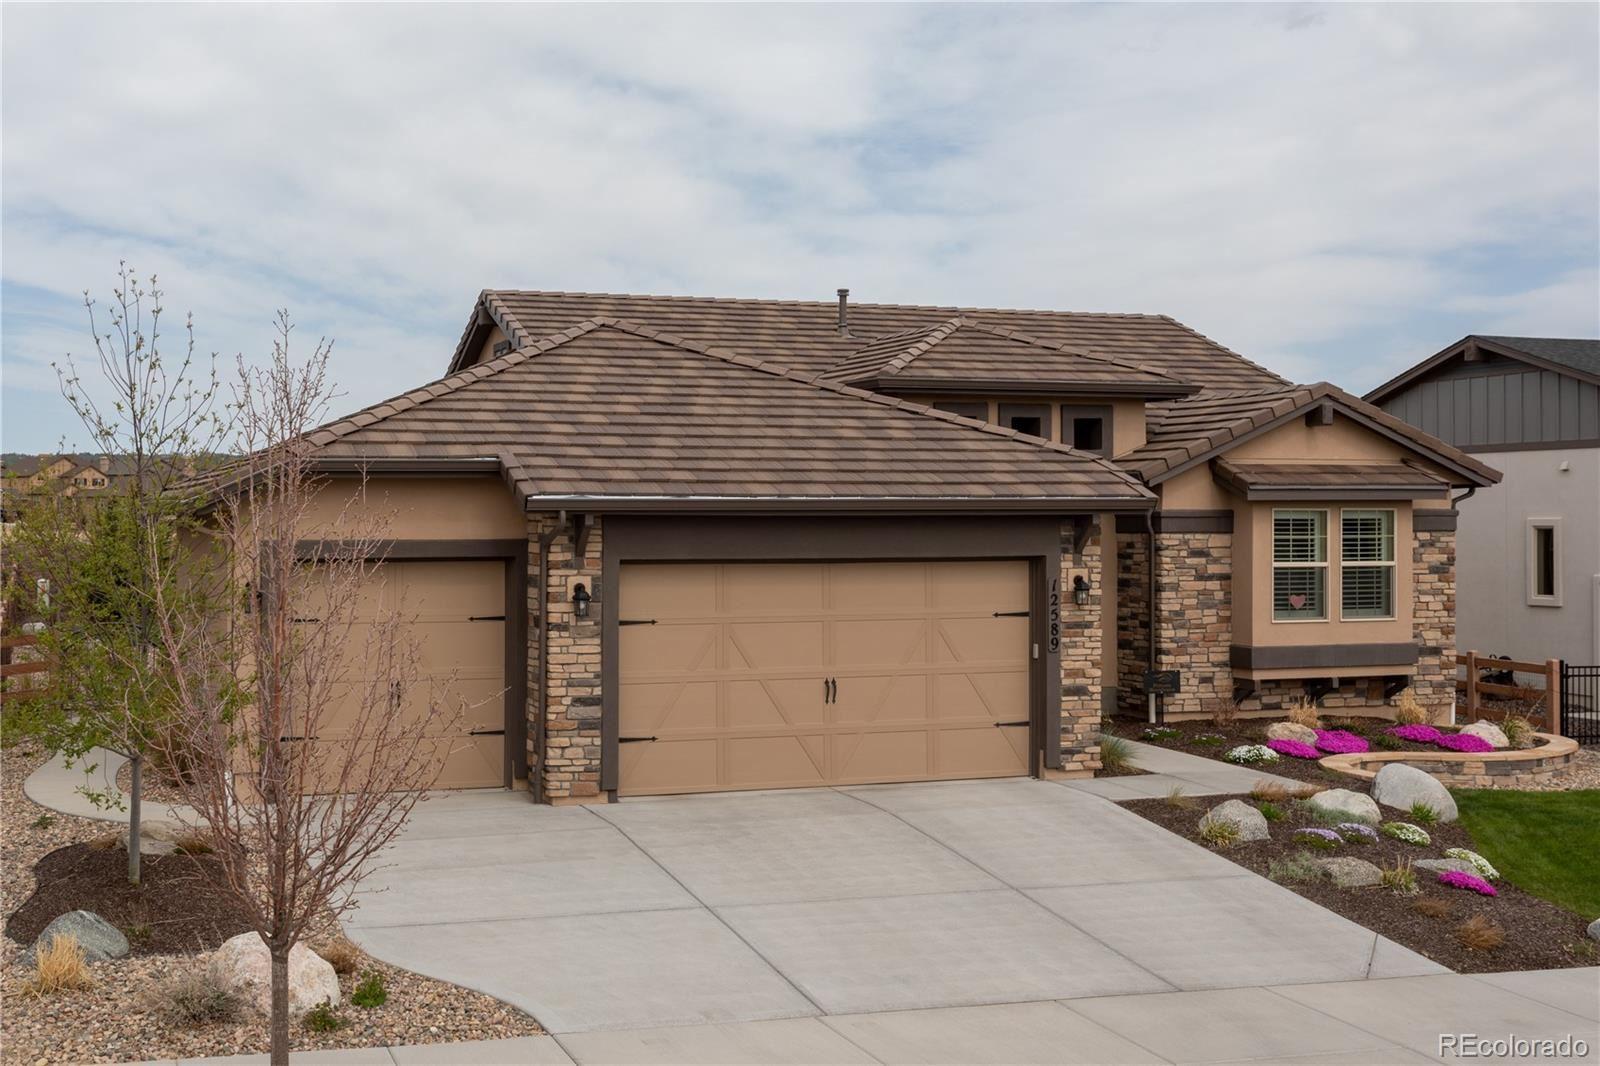 12589 Chianti Court, Colorado Springs, CO 80921 - #: 4935962